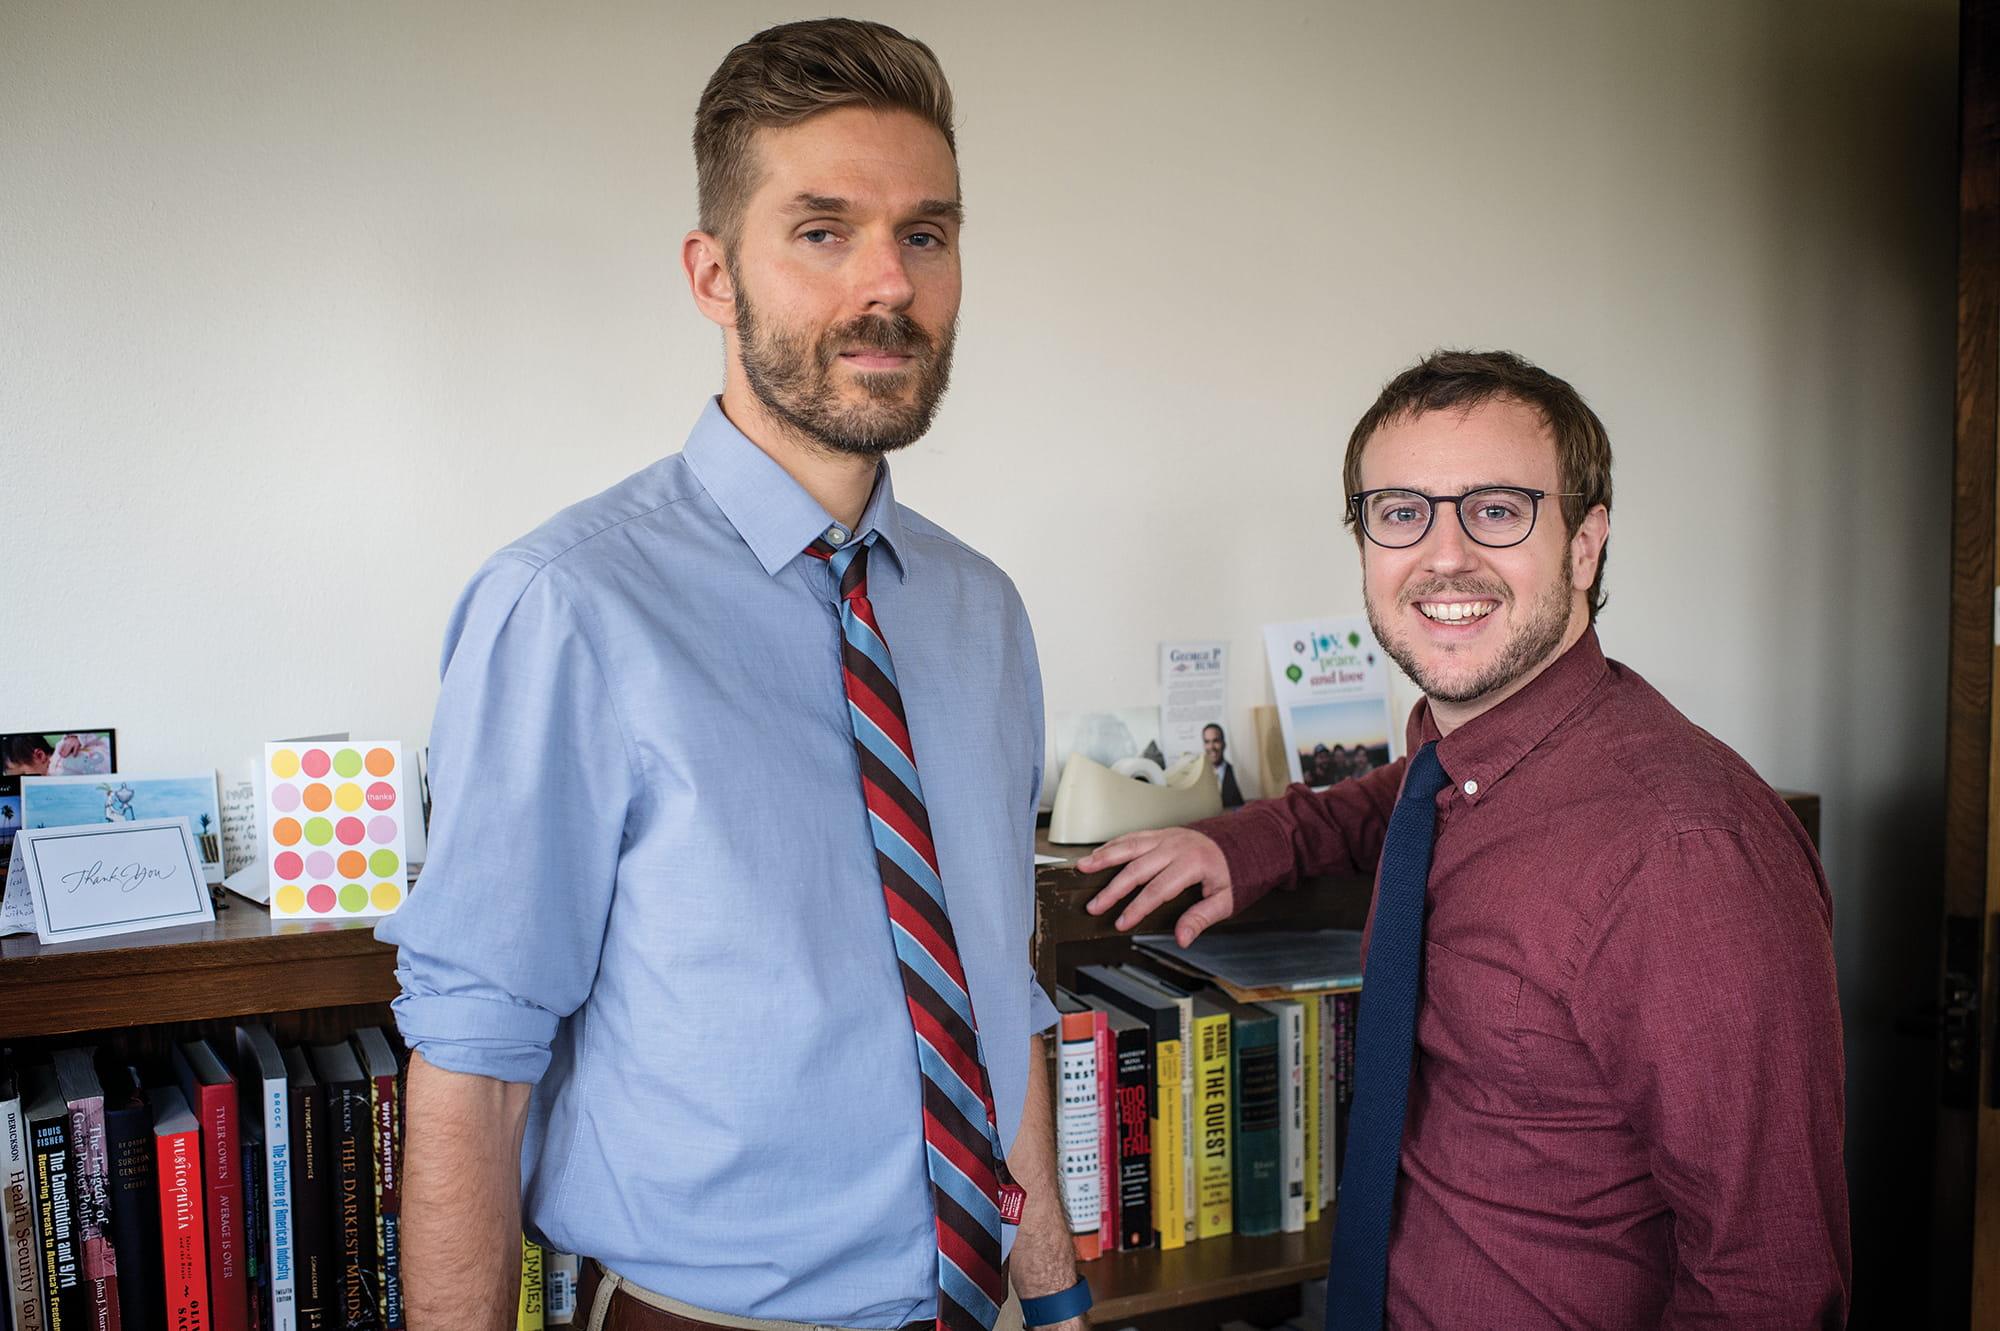 Daniel Sledge, left, and Herschel Thomas